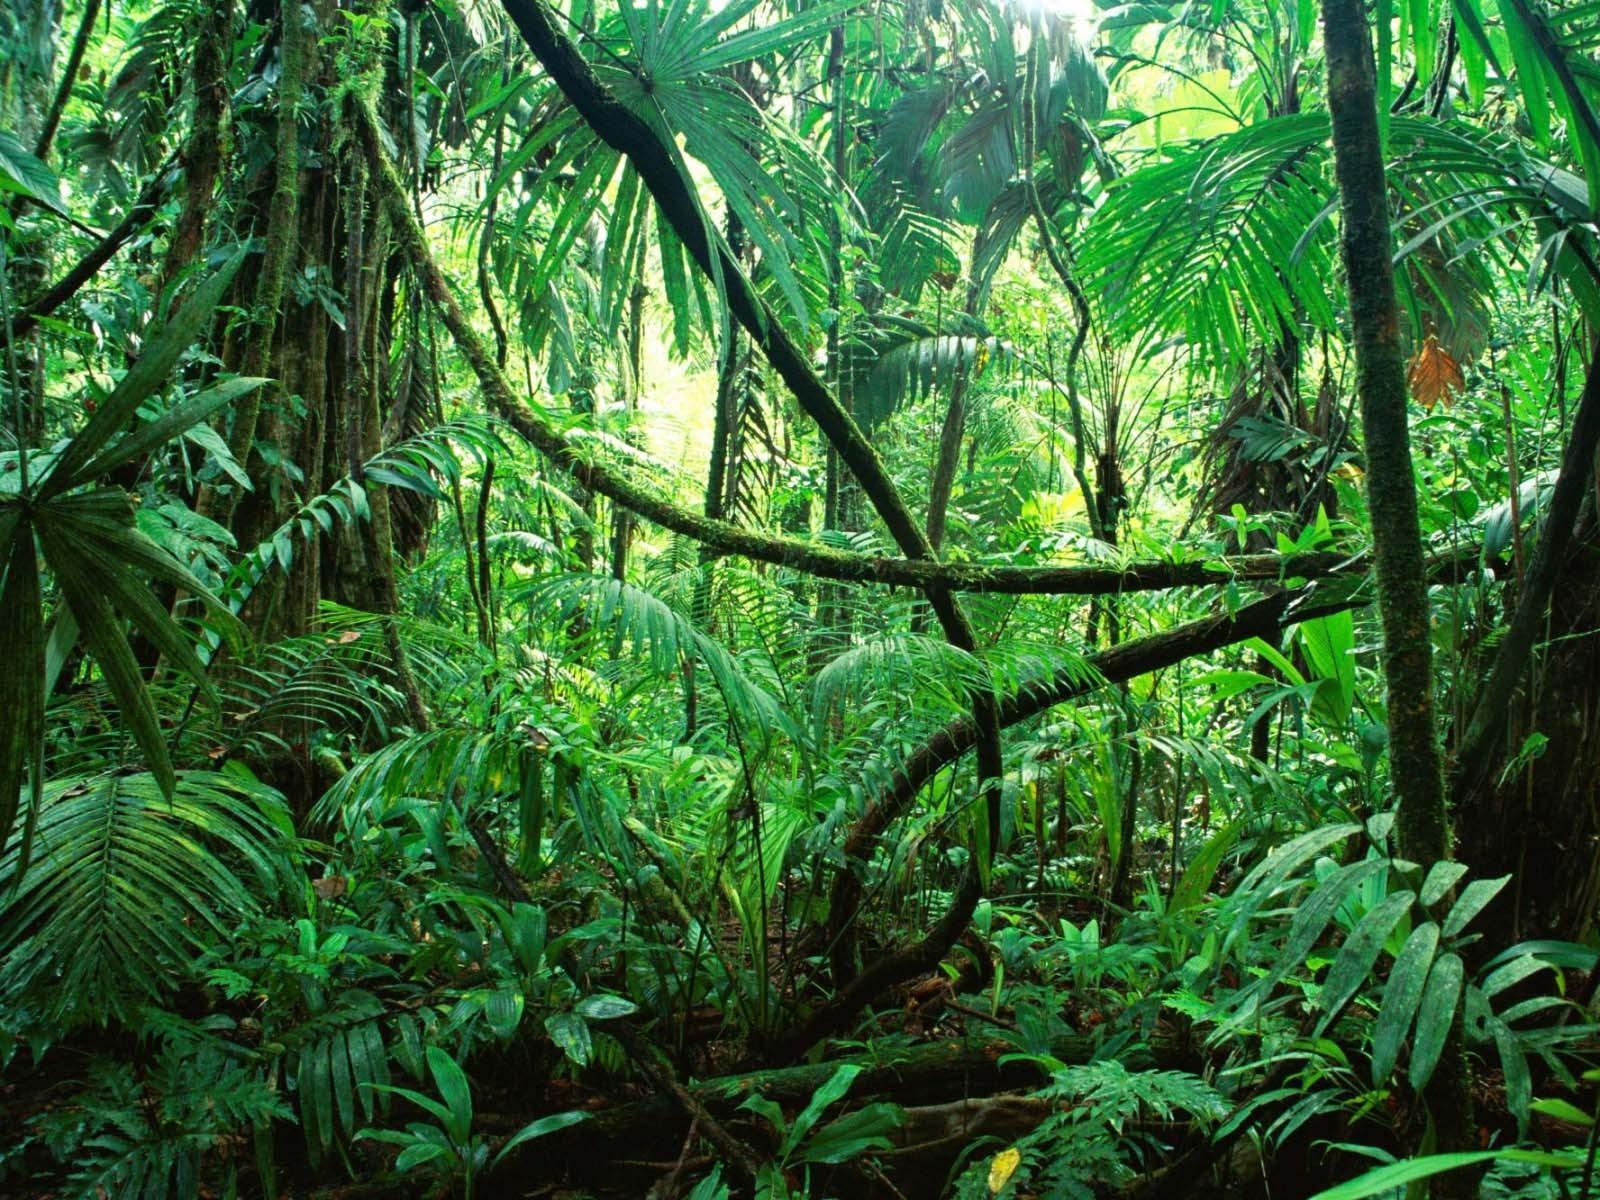 Forest Amazon Wallpaper 1600x1200 Forest Amazon Rainforest 1600x1200